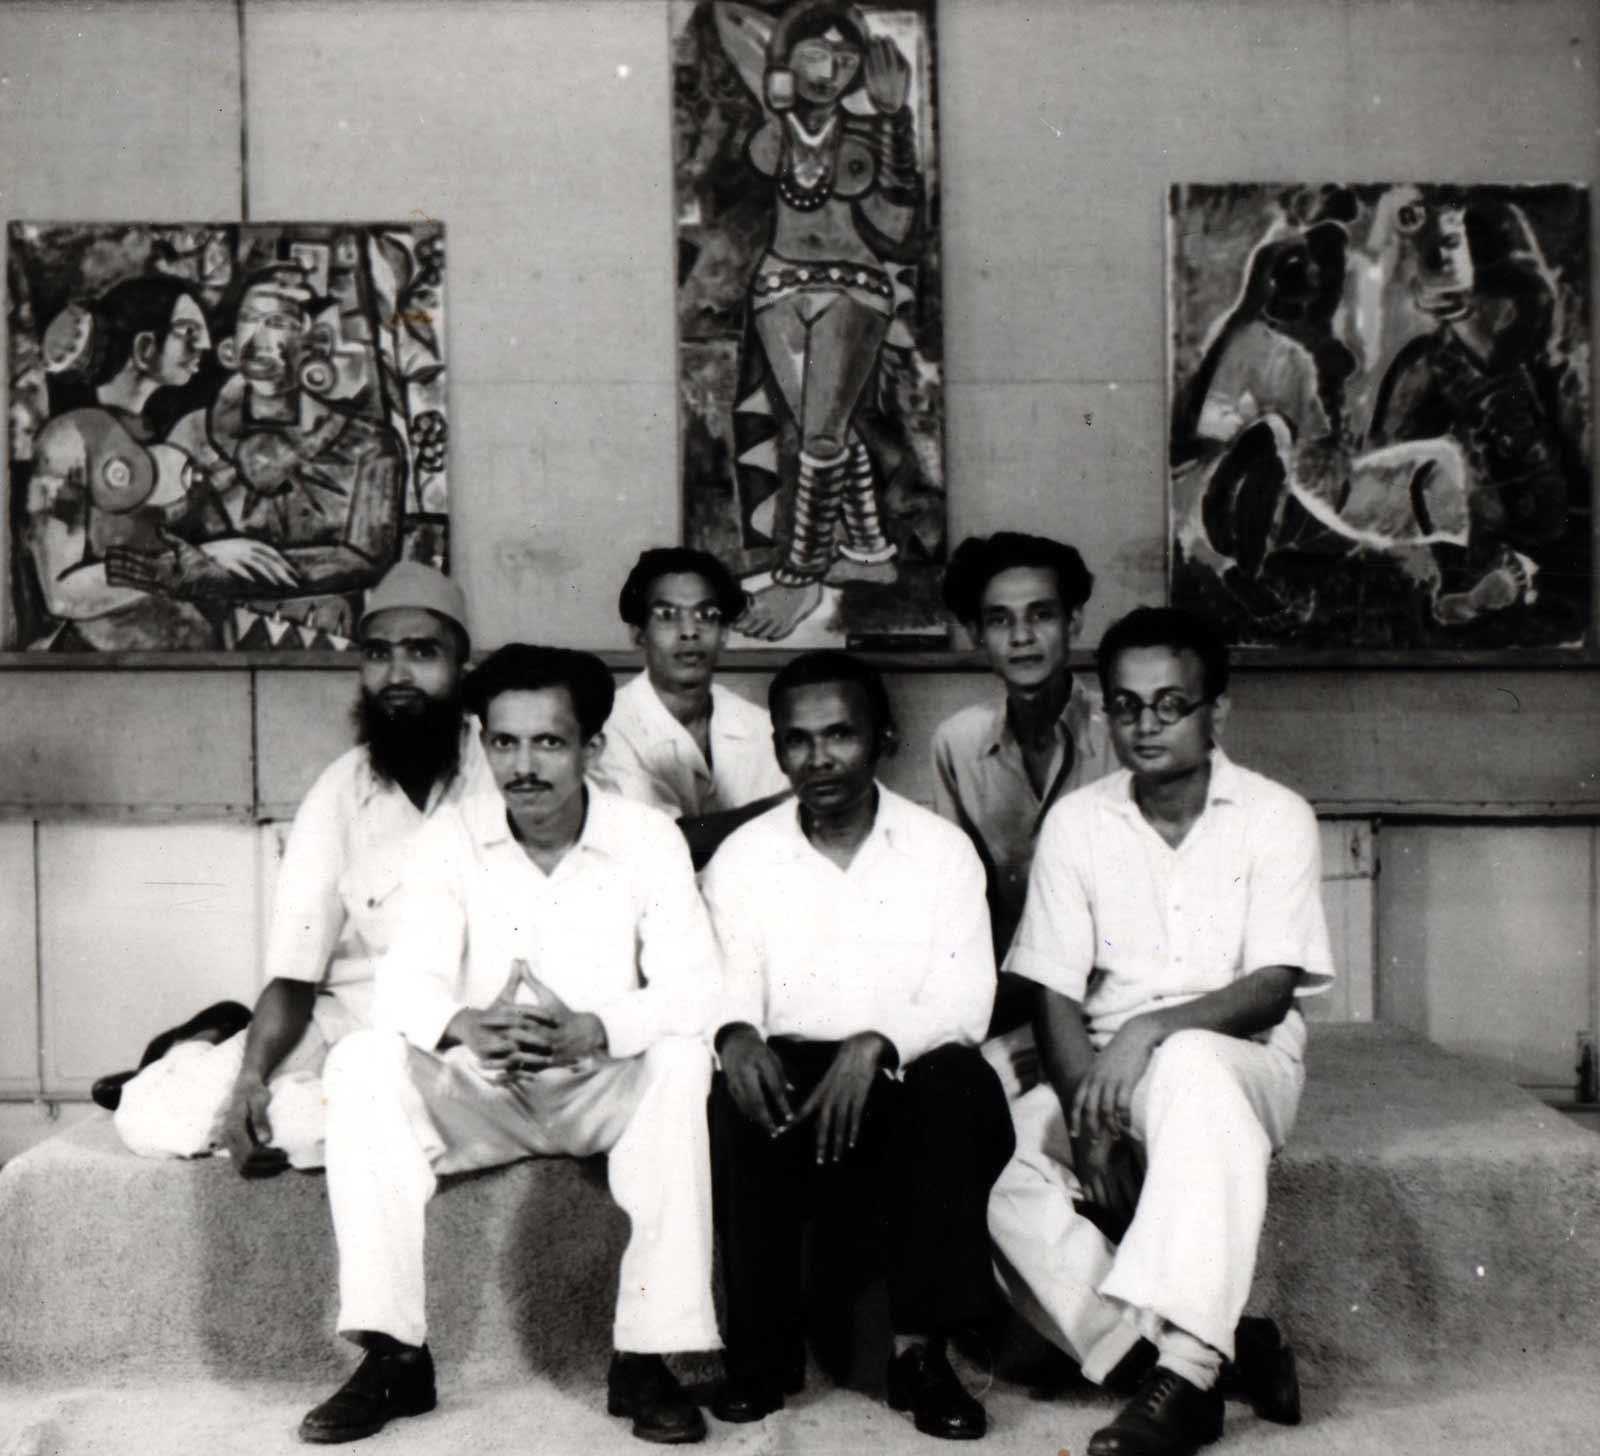 The Modern Art of Independent India | by Ratik Asokan | NYR